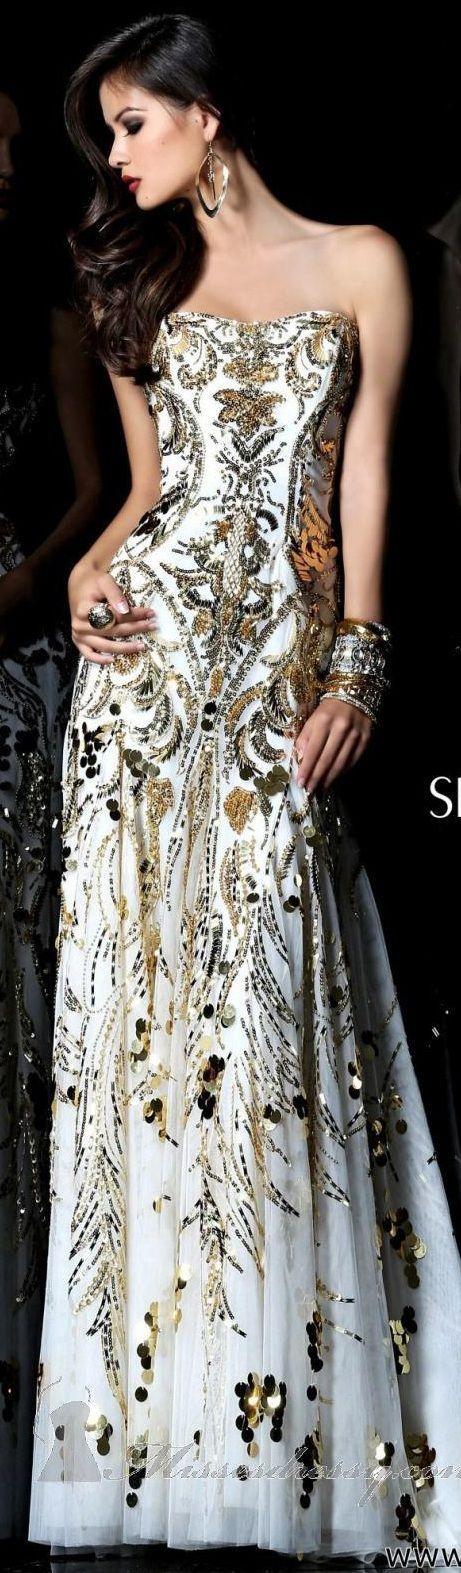 Sherri Hill couture